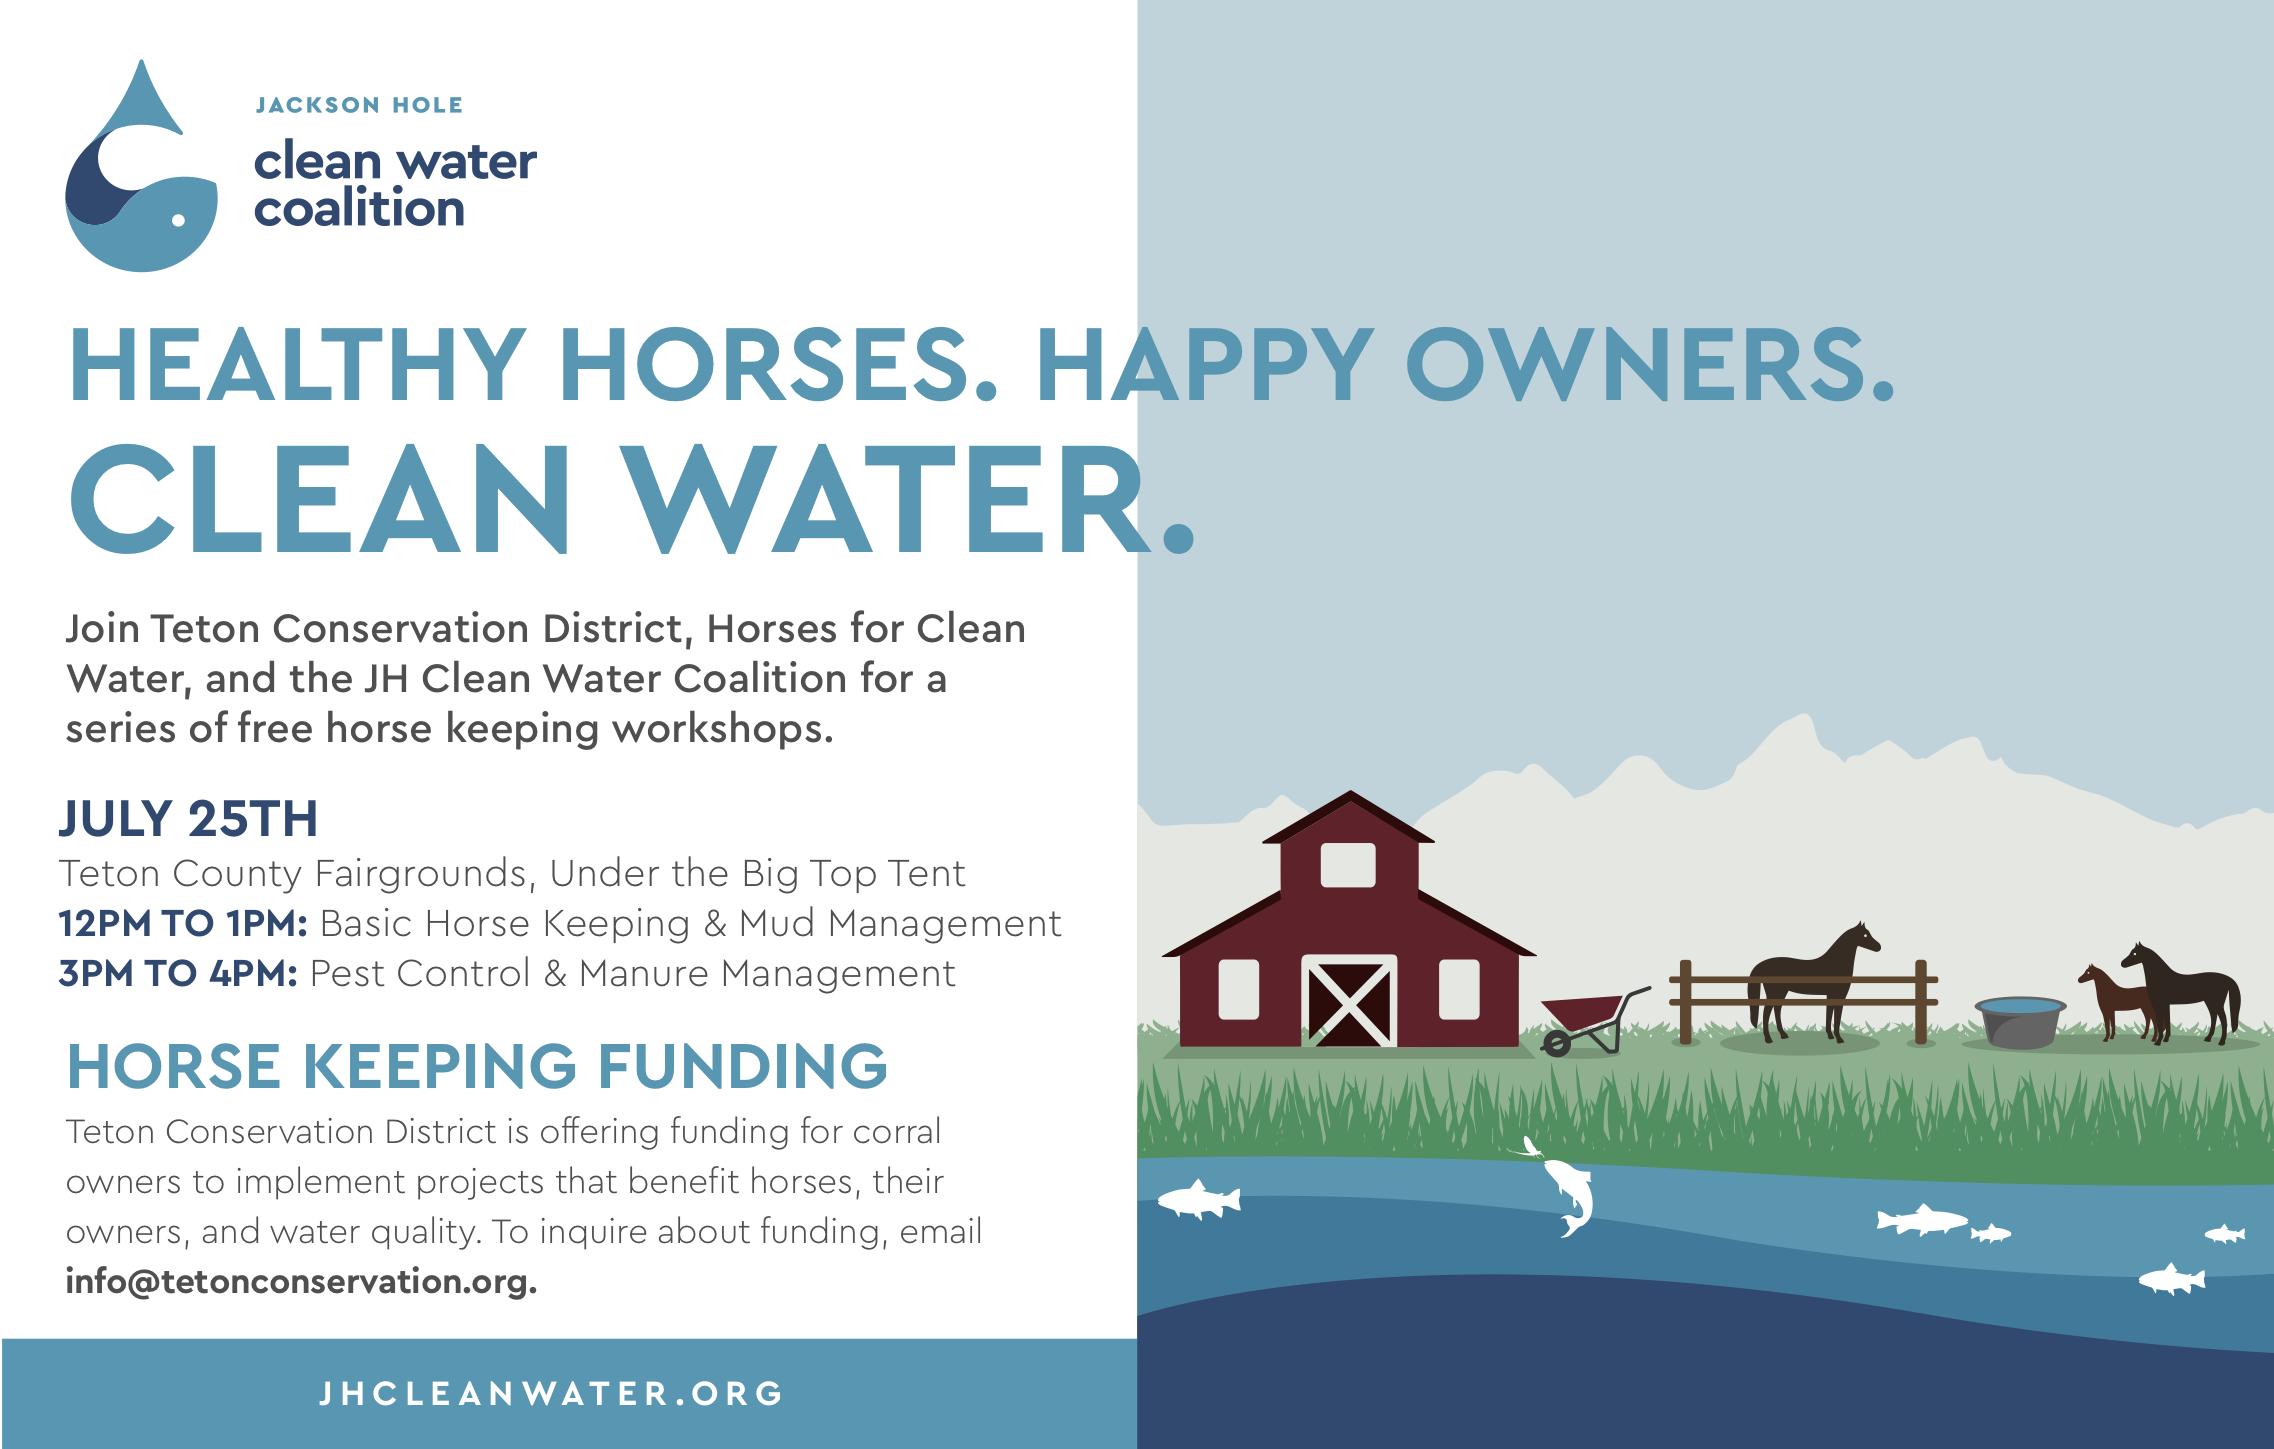 horsekeeping-ad-large-jpeg.jpg